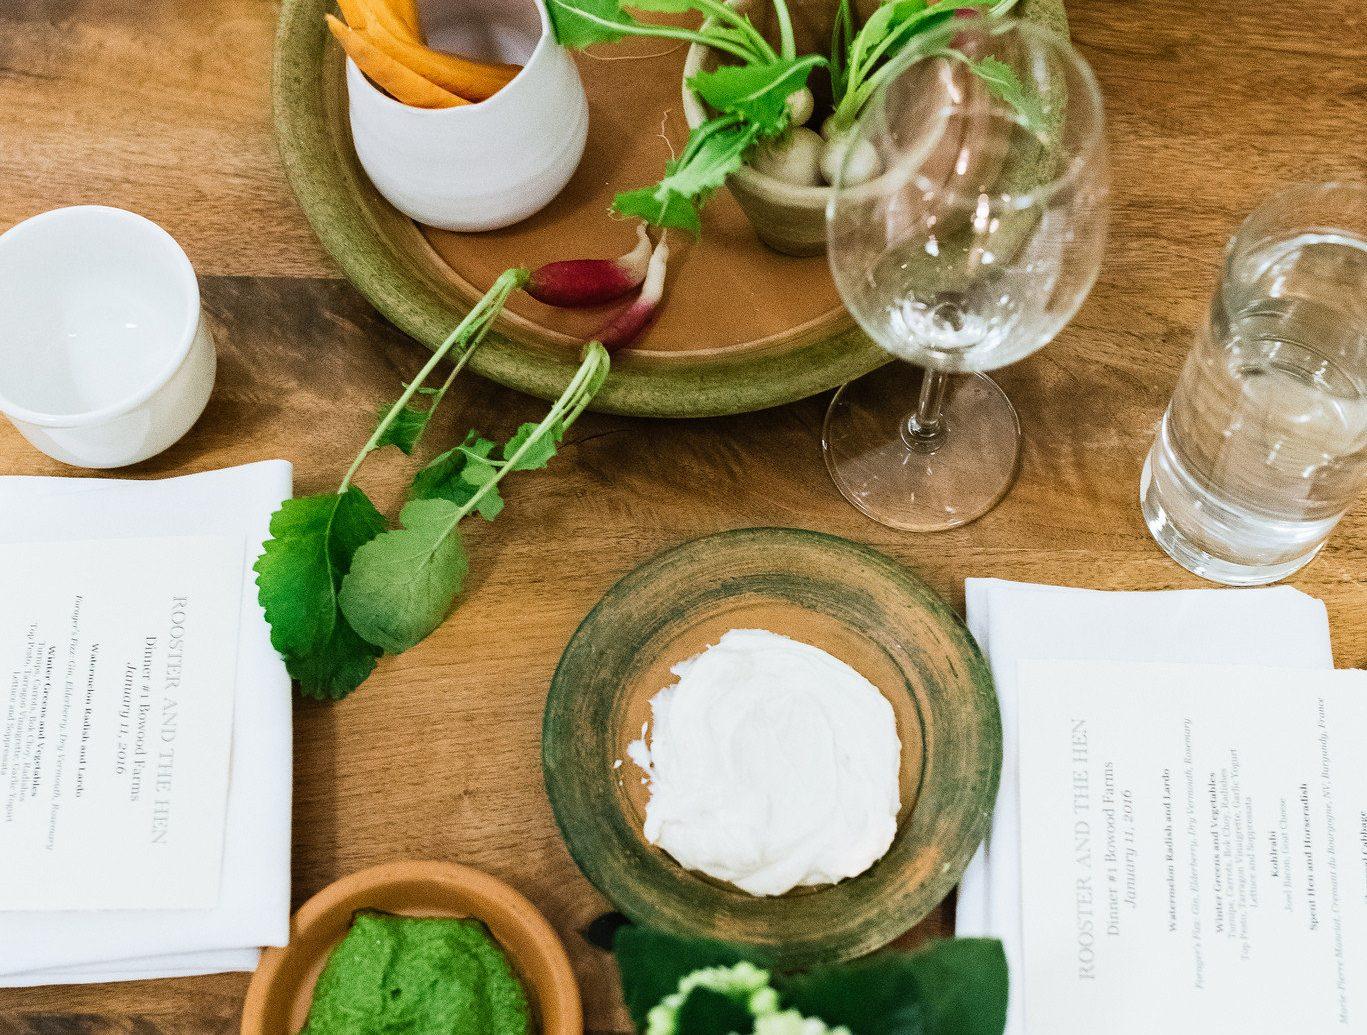 Arts + Culture table green flower arranging floristry meal floral design produce flower herb food centrepiece cluttered